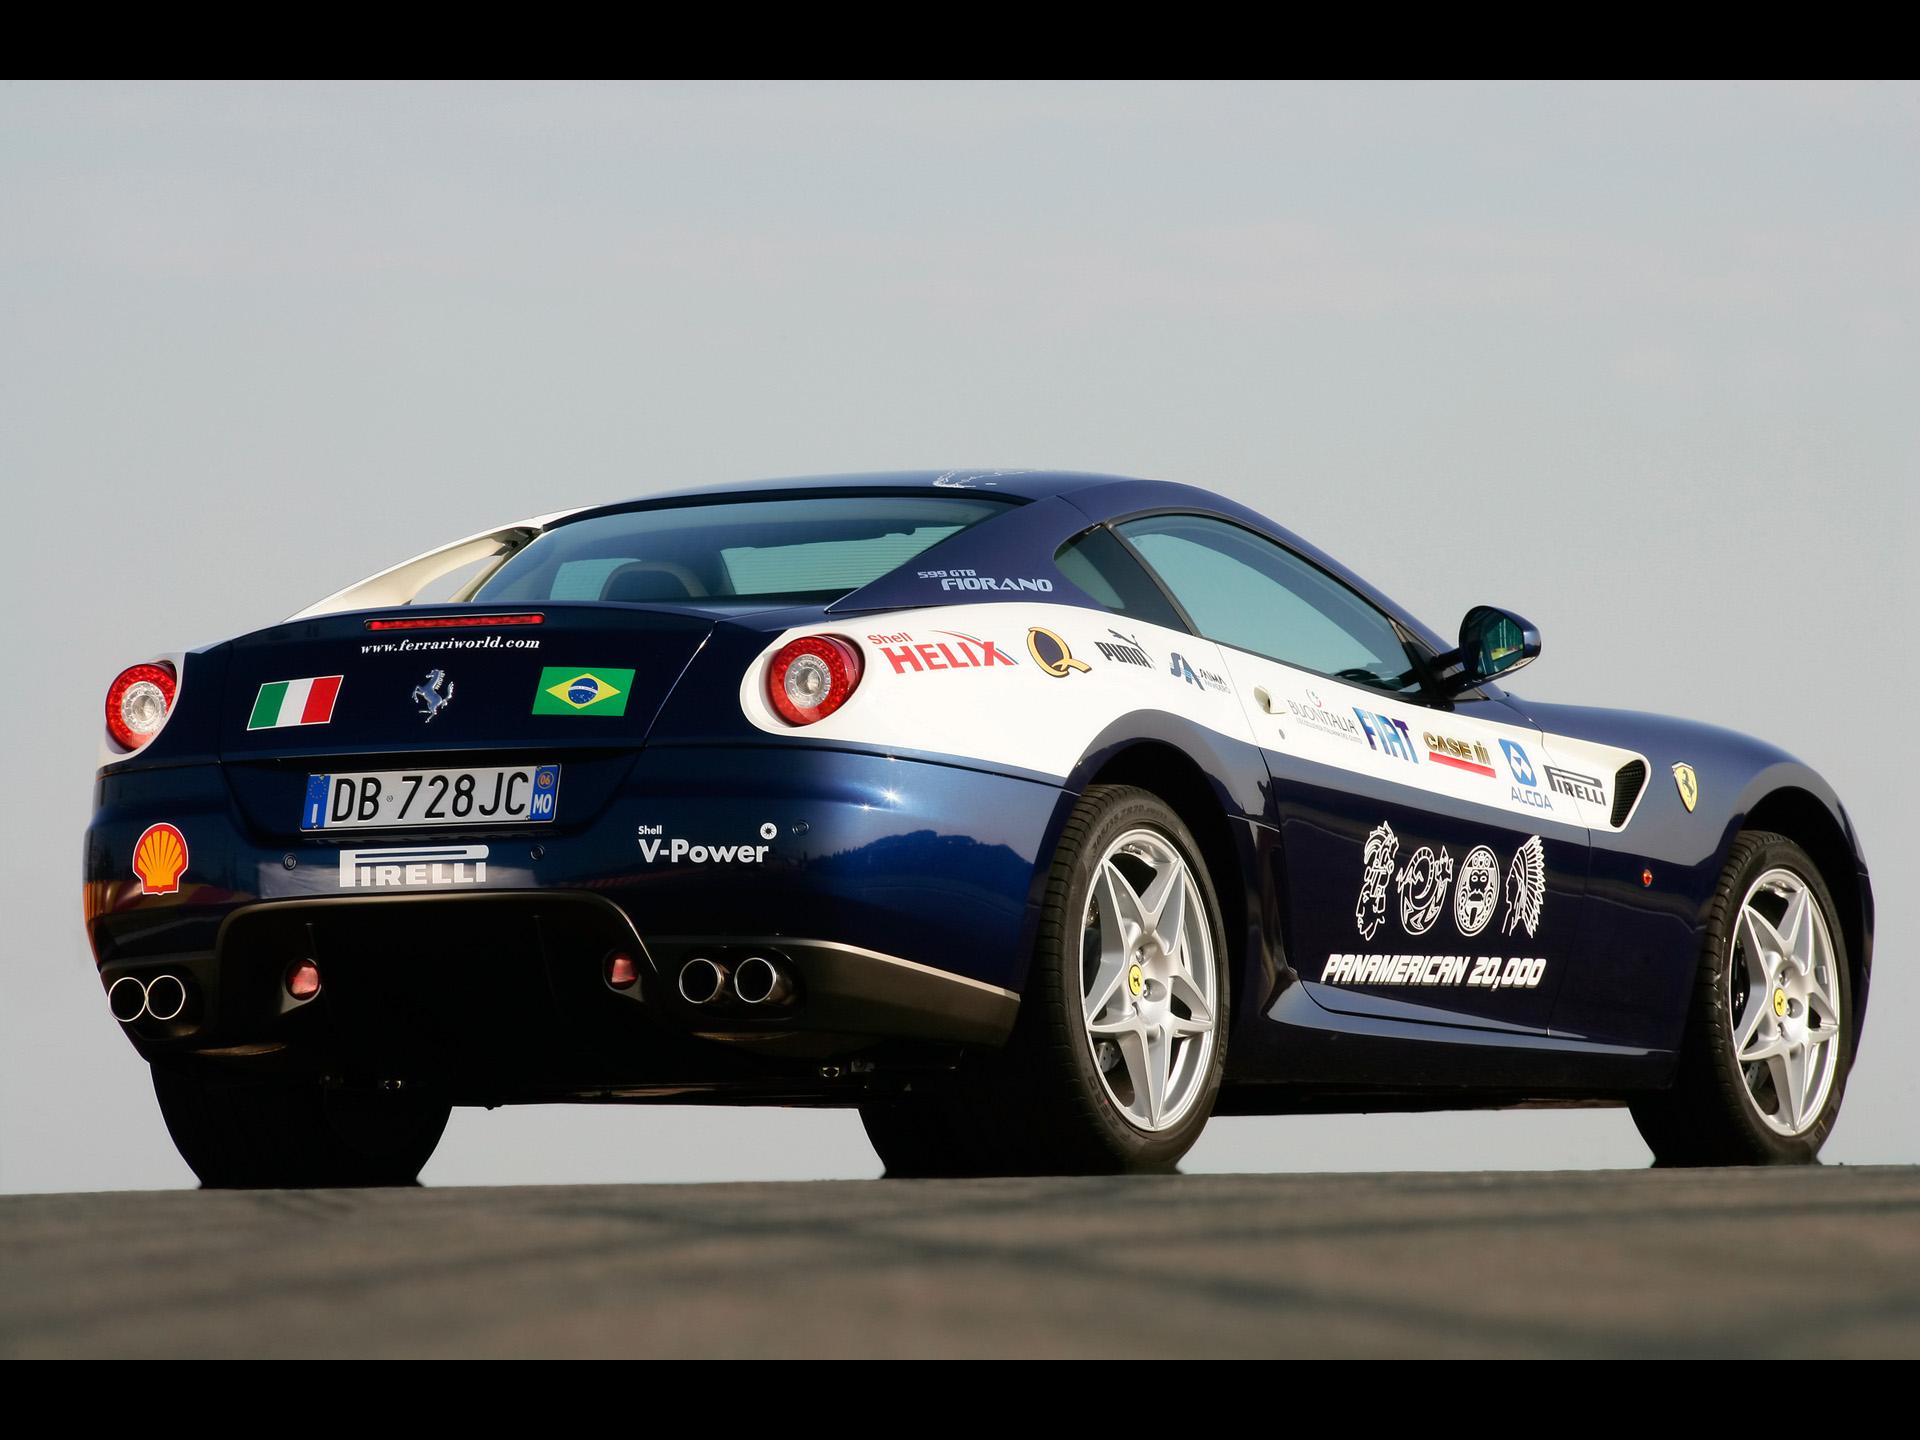 Ferrari 599 gtb photos photogallery with 18 pics carsbase new ferrari 599 gtb pictures vanachro Images